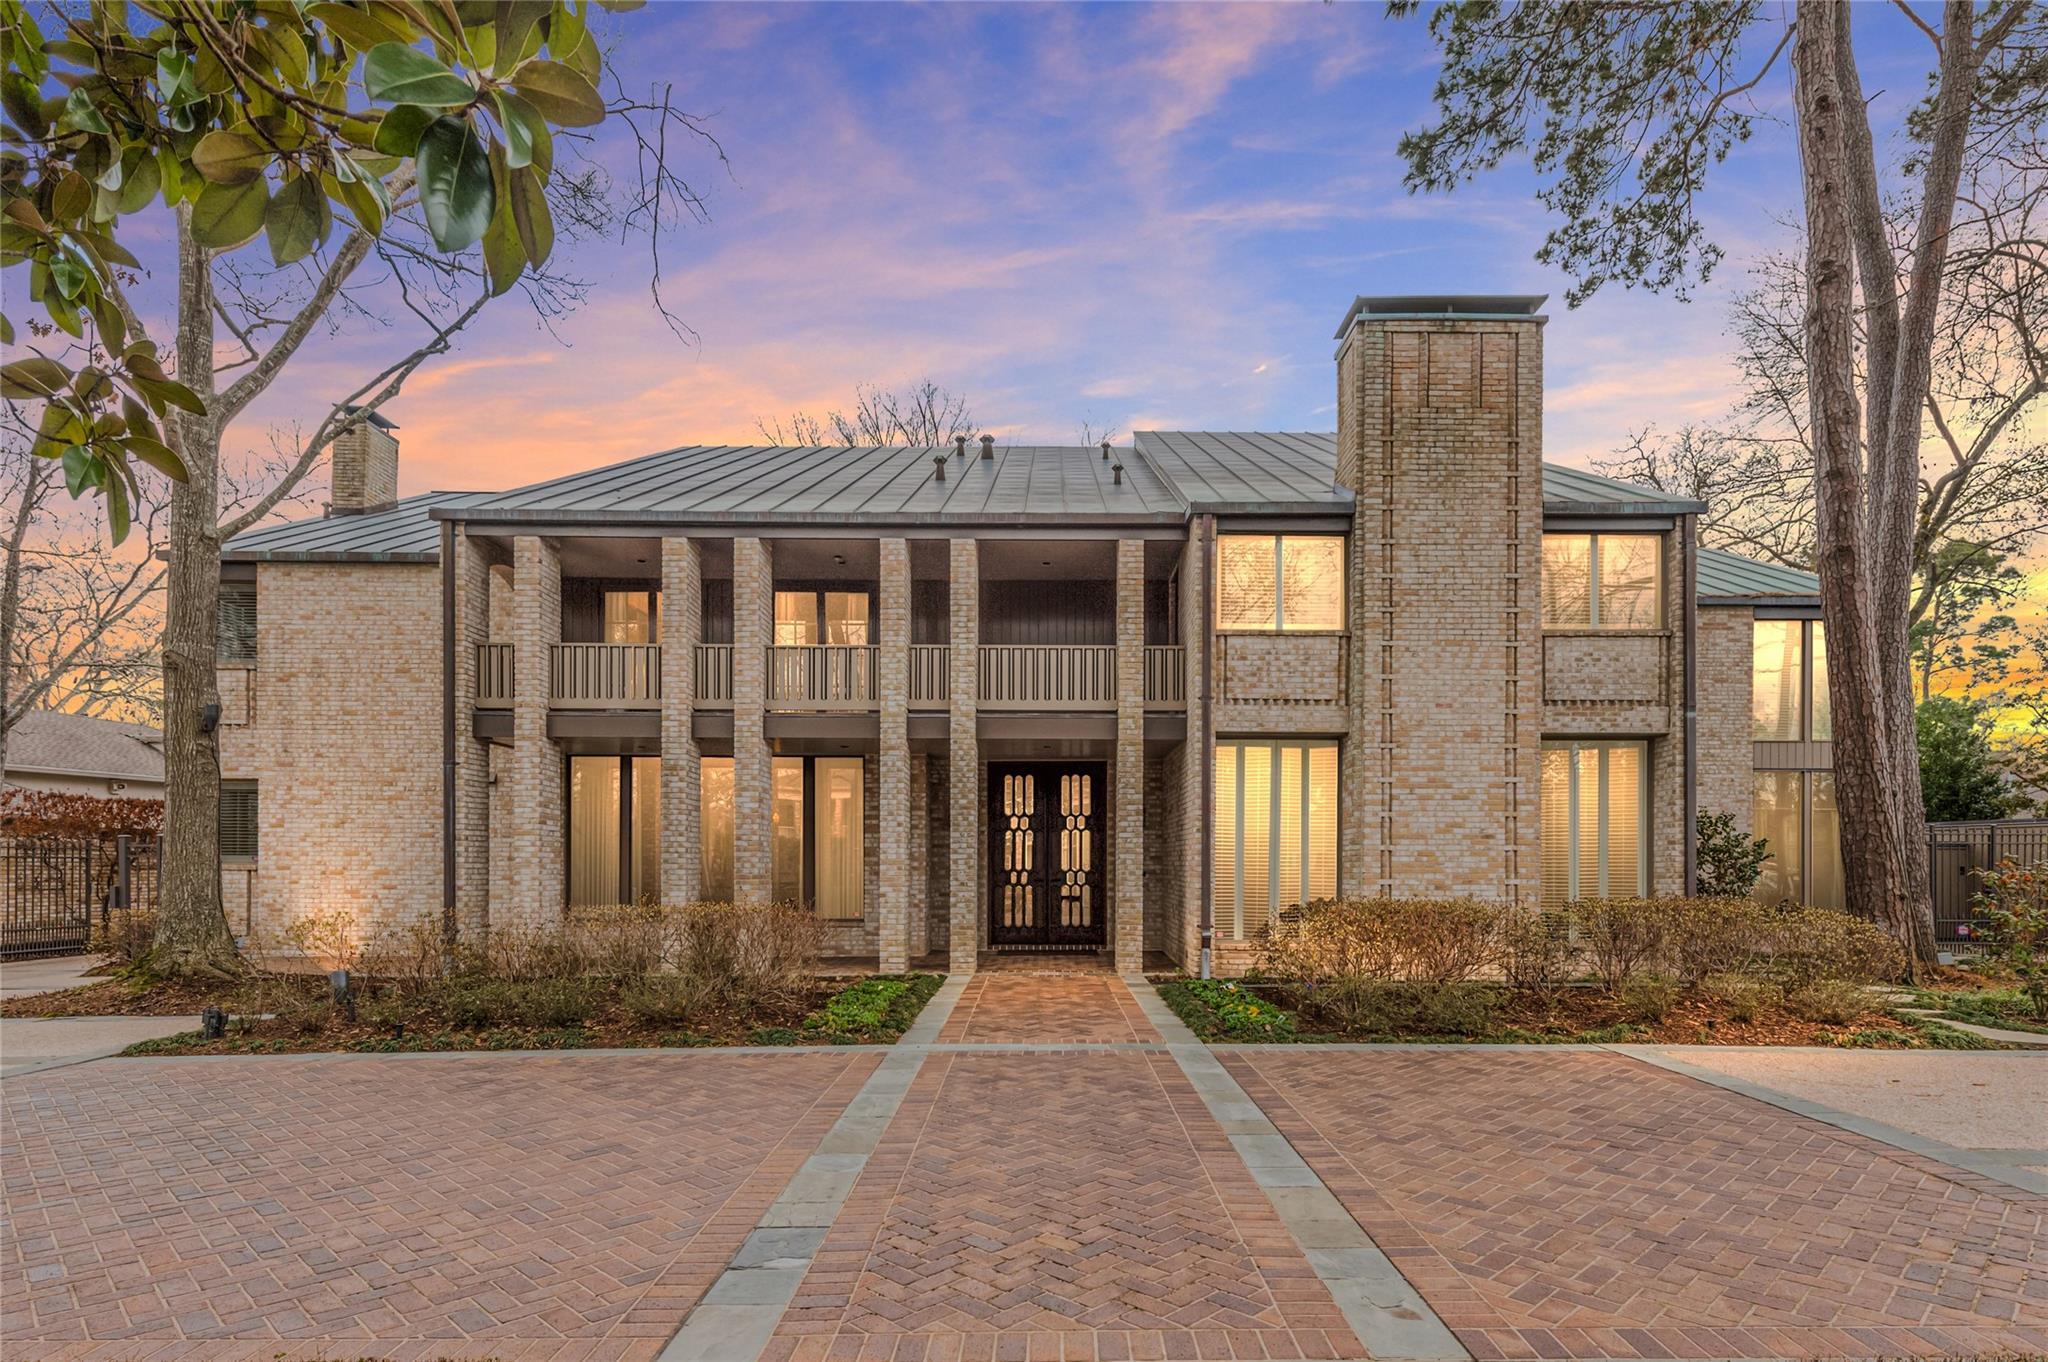 307 Shadywood Property Photo - Houston, TX real estate listing